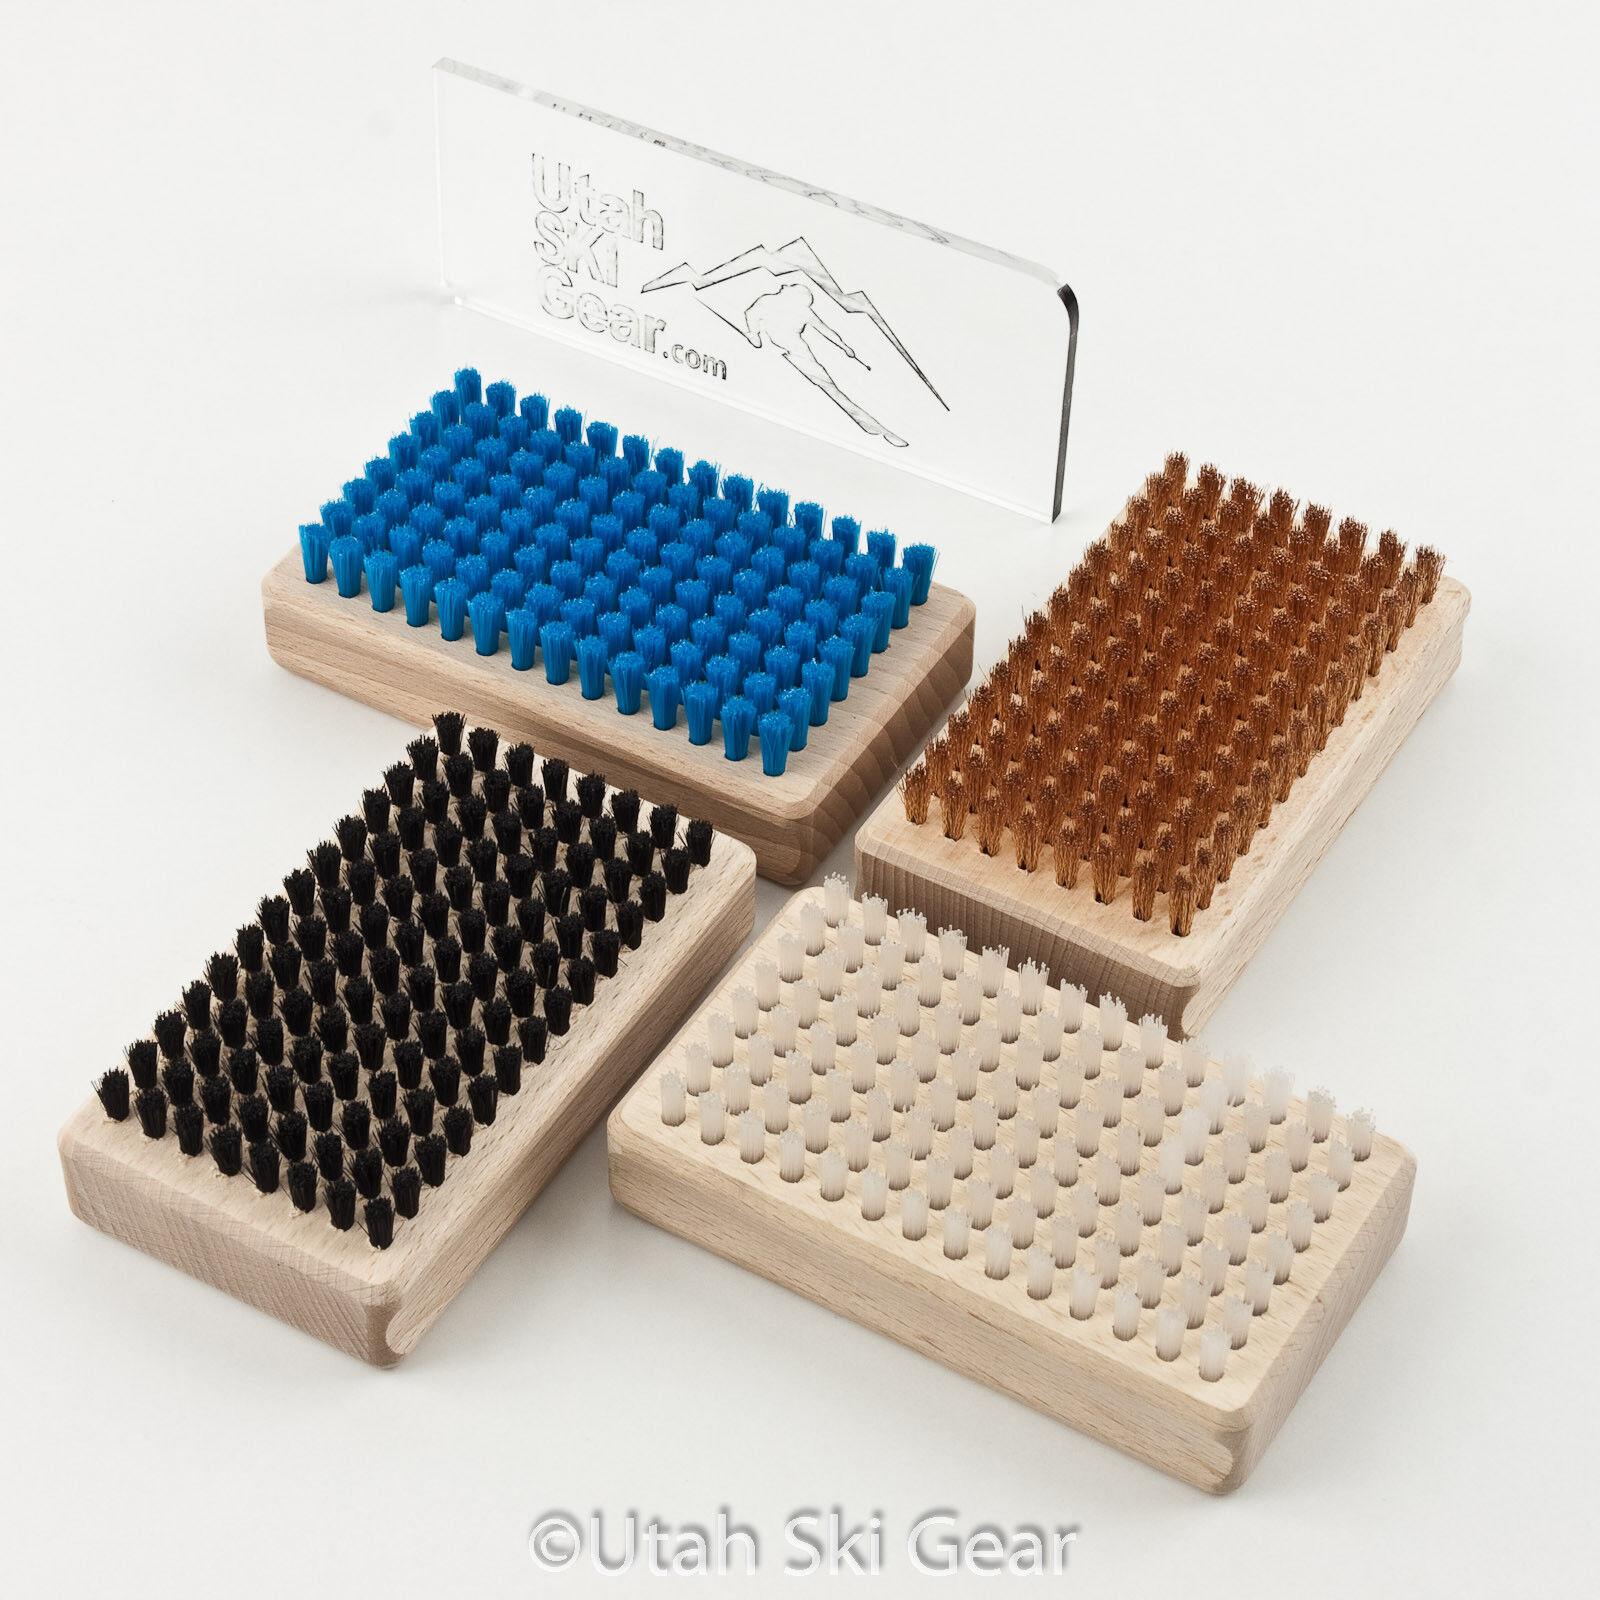 Wintersteiger Base Brush Kit Rectangular for Skis and Snowboards by Utah Ski ...